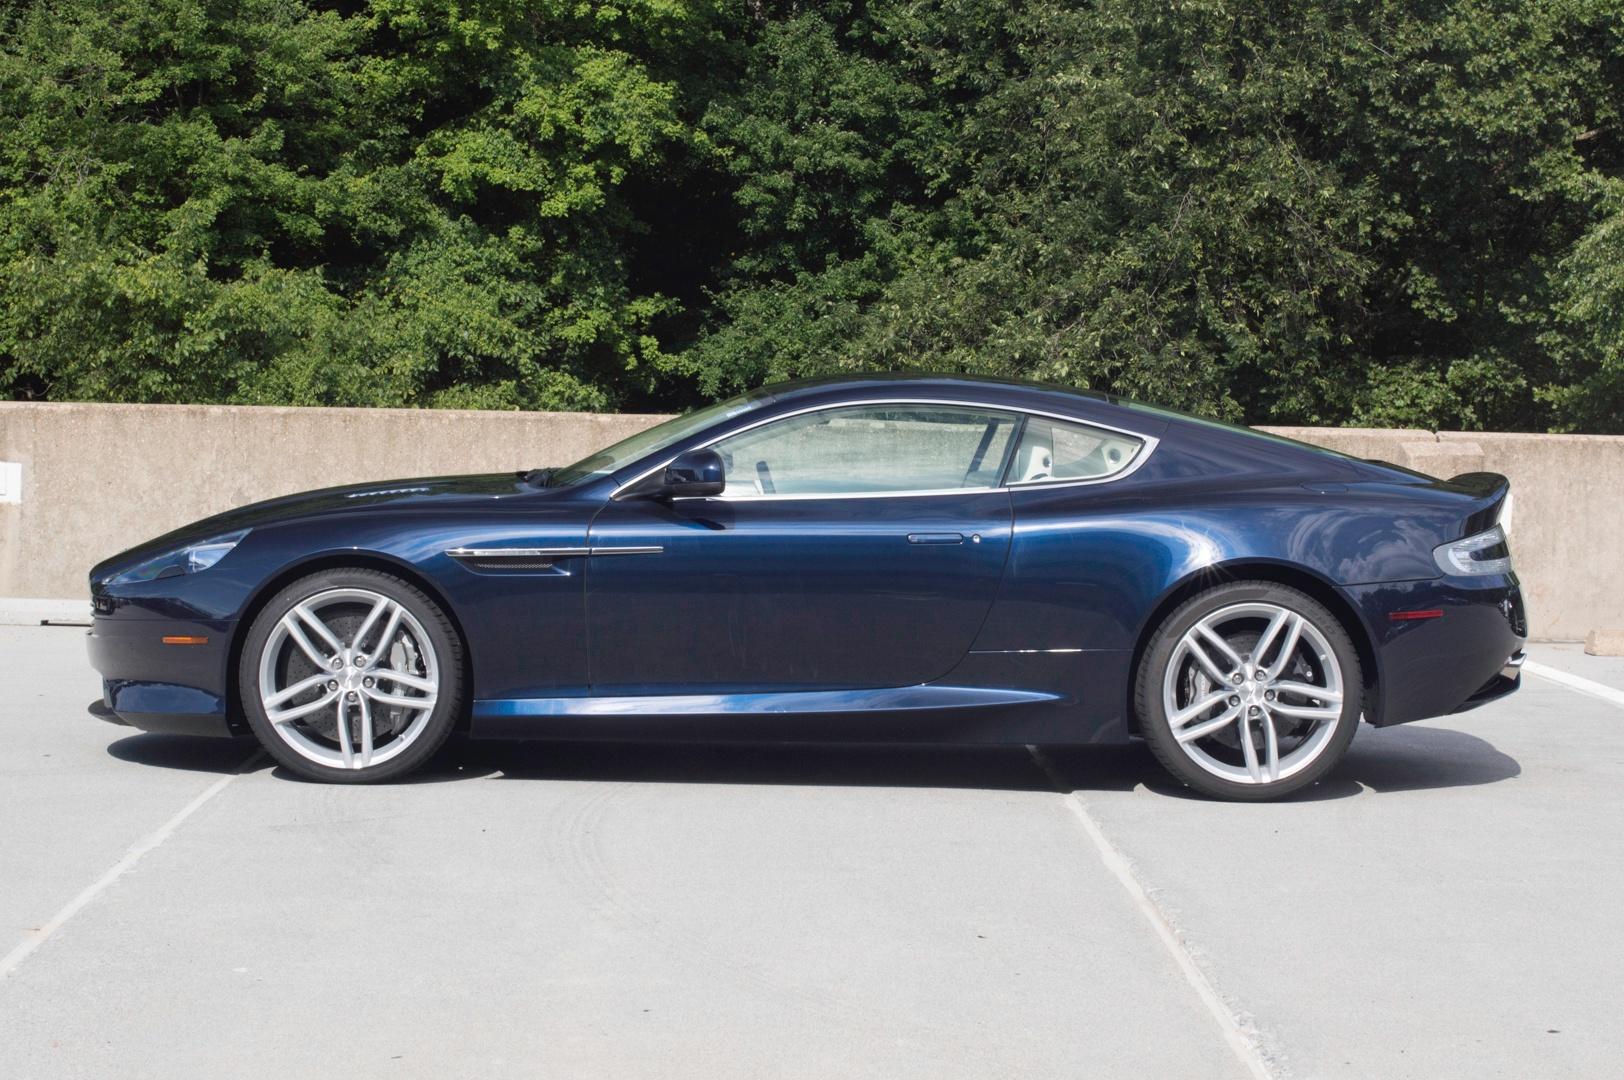 2014 aston martin db9 stock 4na15832 for sale near vienna va va aston ma. Cars Review. Best American Auto & Cars Review